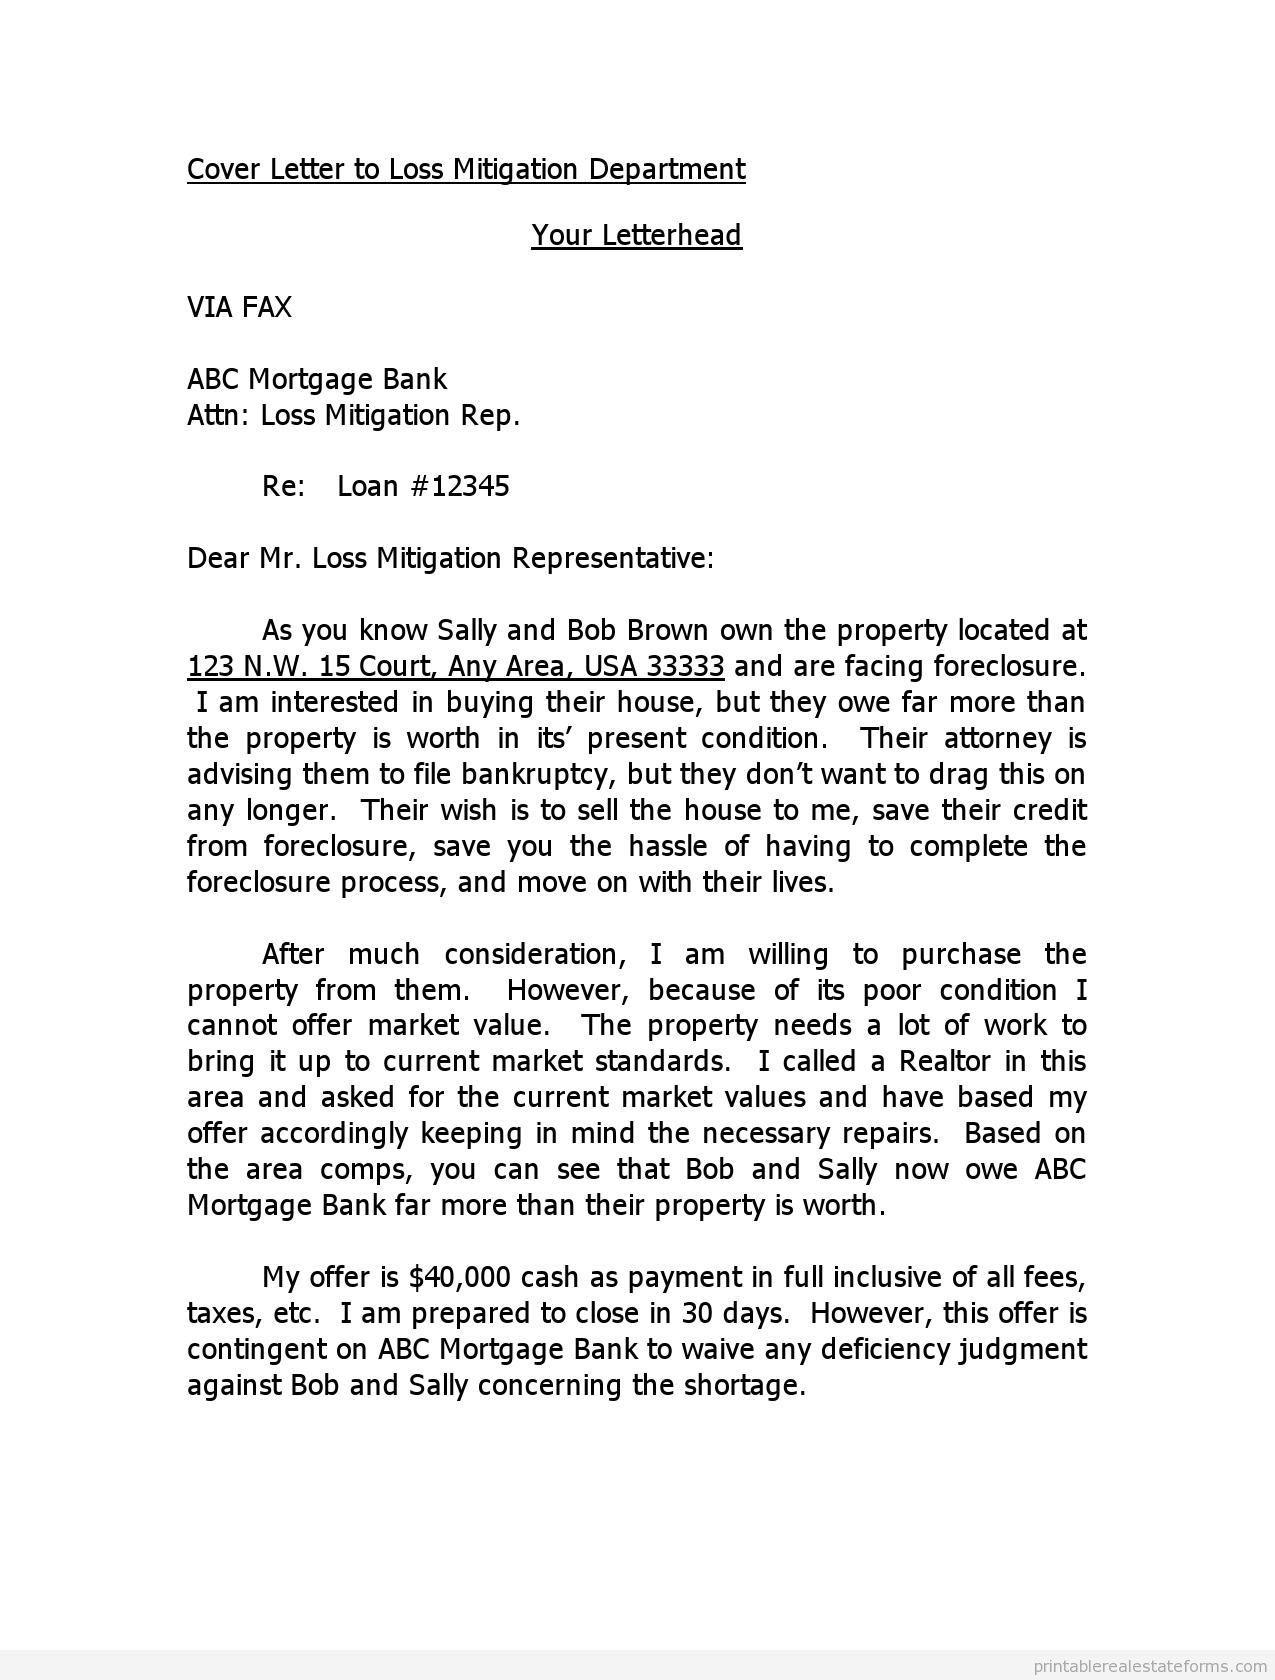 Lease broker cover letter October 28